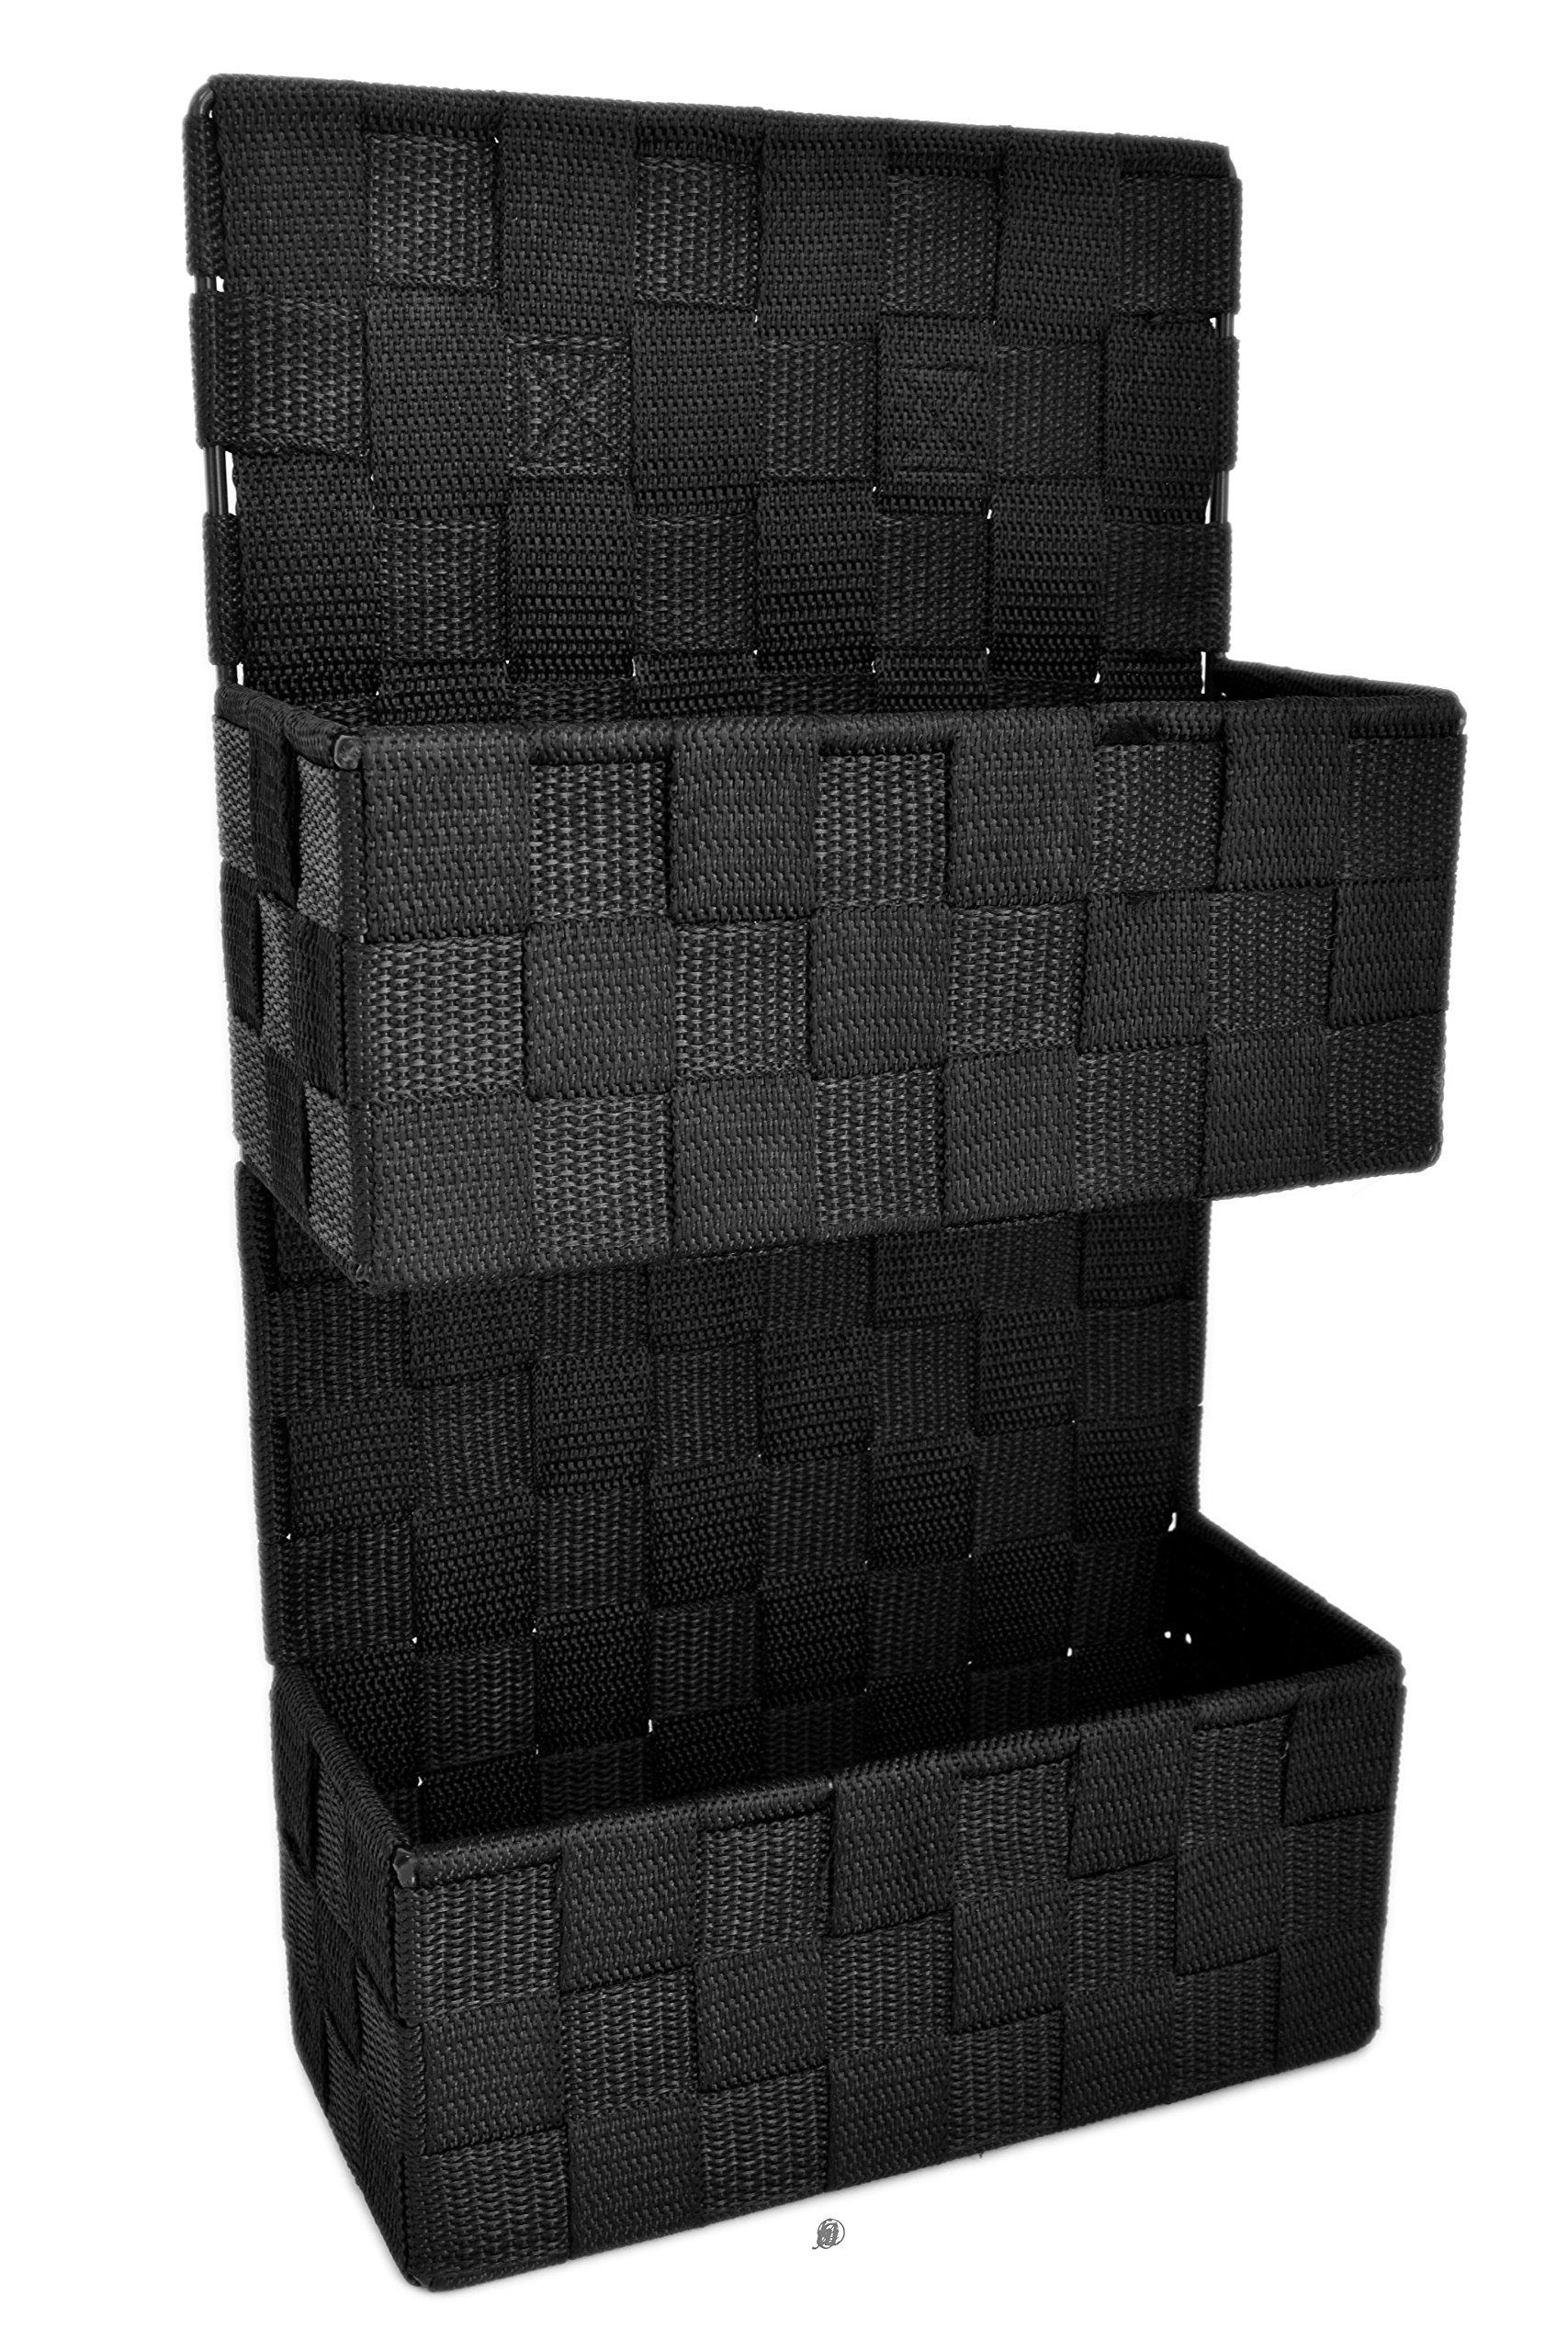 American Chateau Black Wall Mount Durable Nylon Weave Basket Organizer Letter Holder Mail Sorter